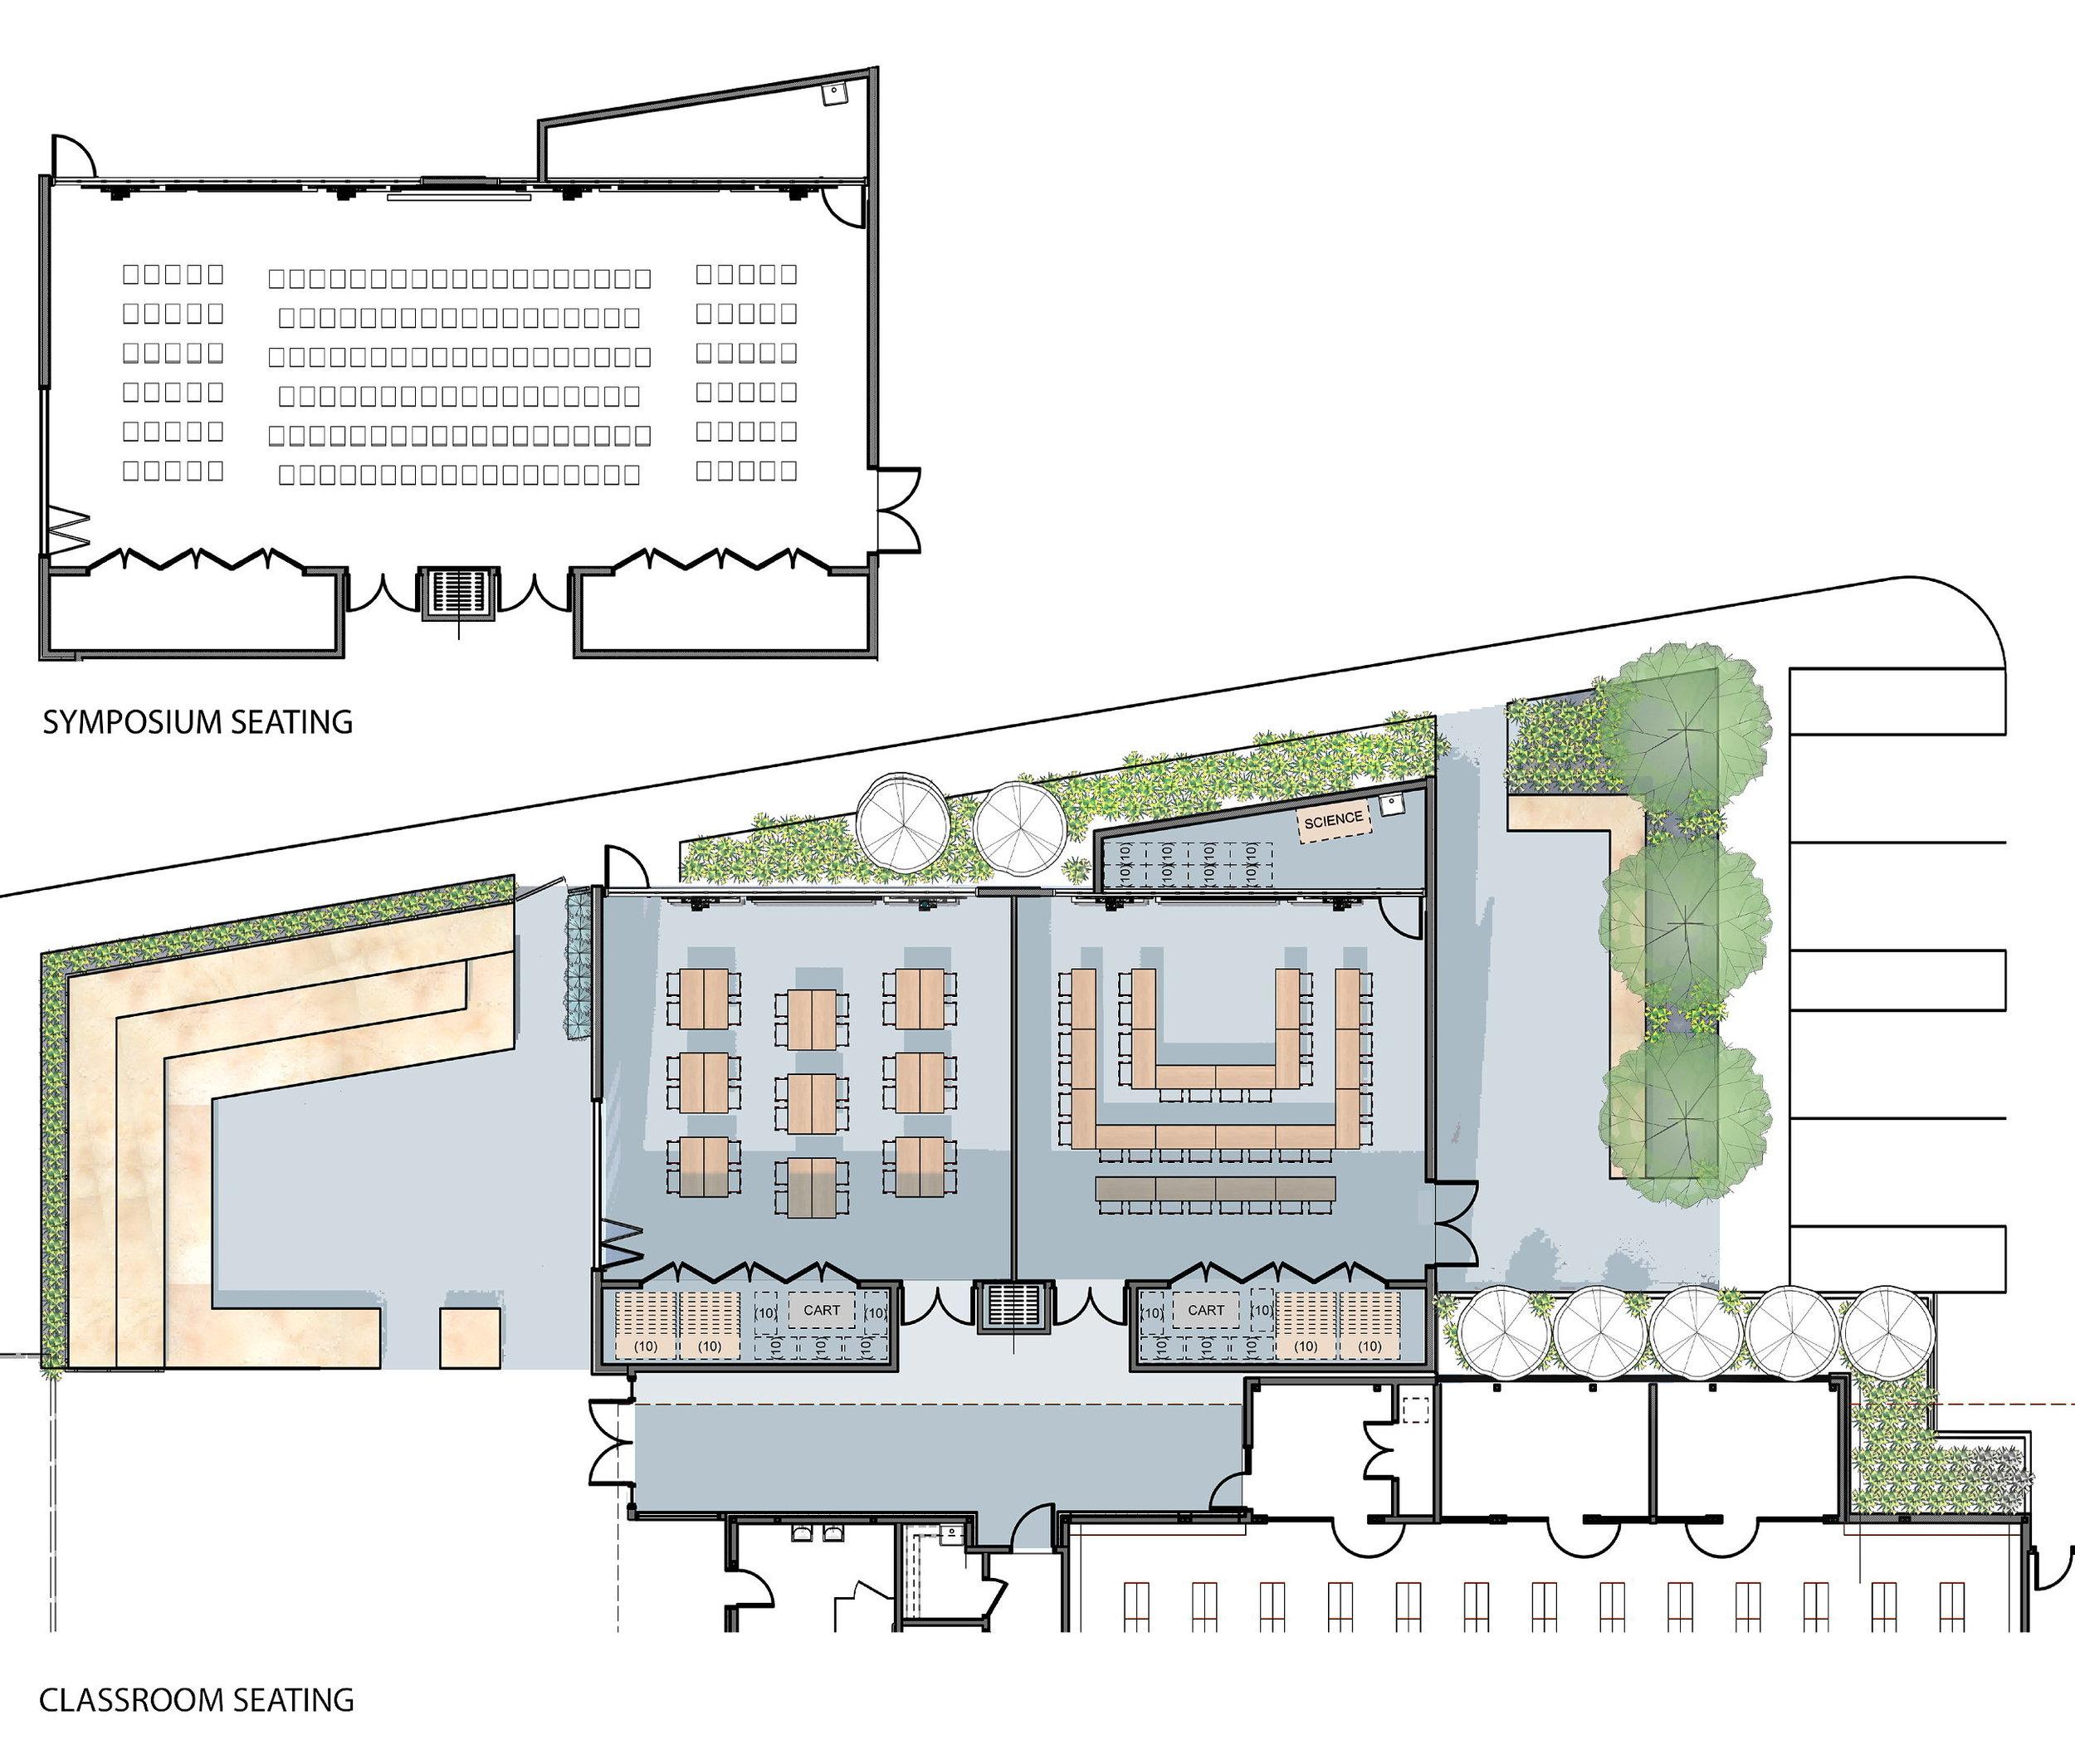 Plan of Global Learning Center